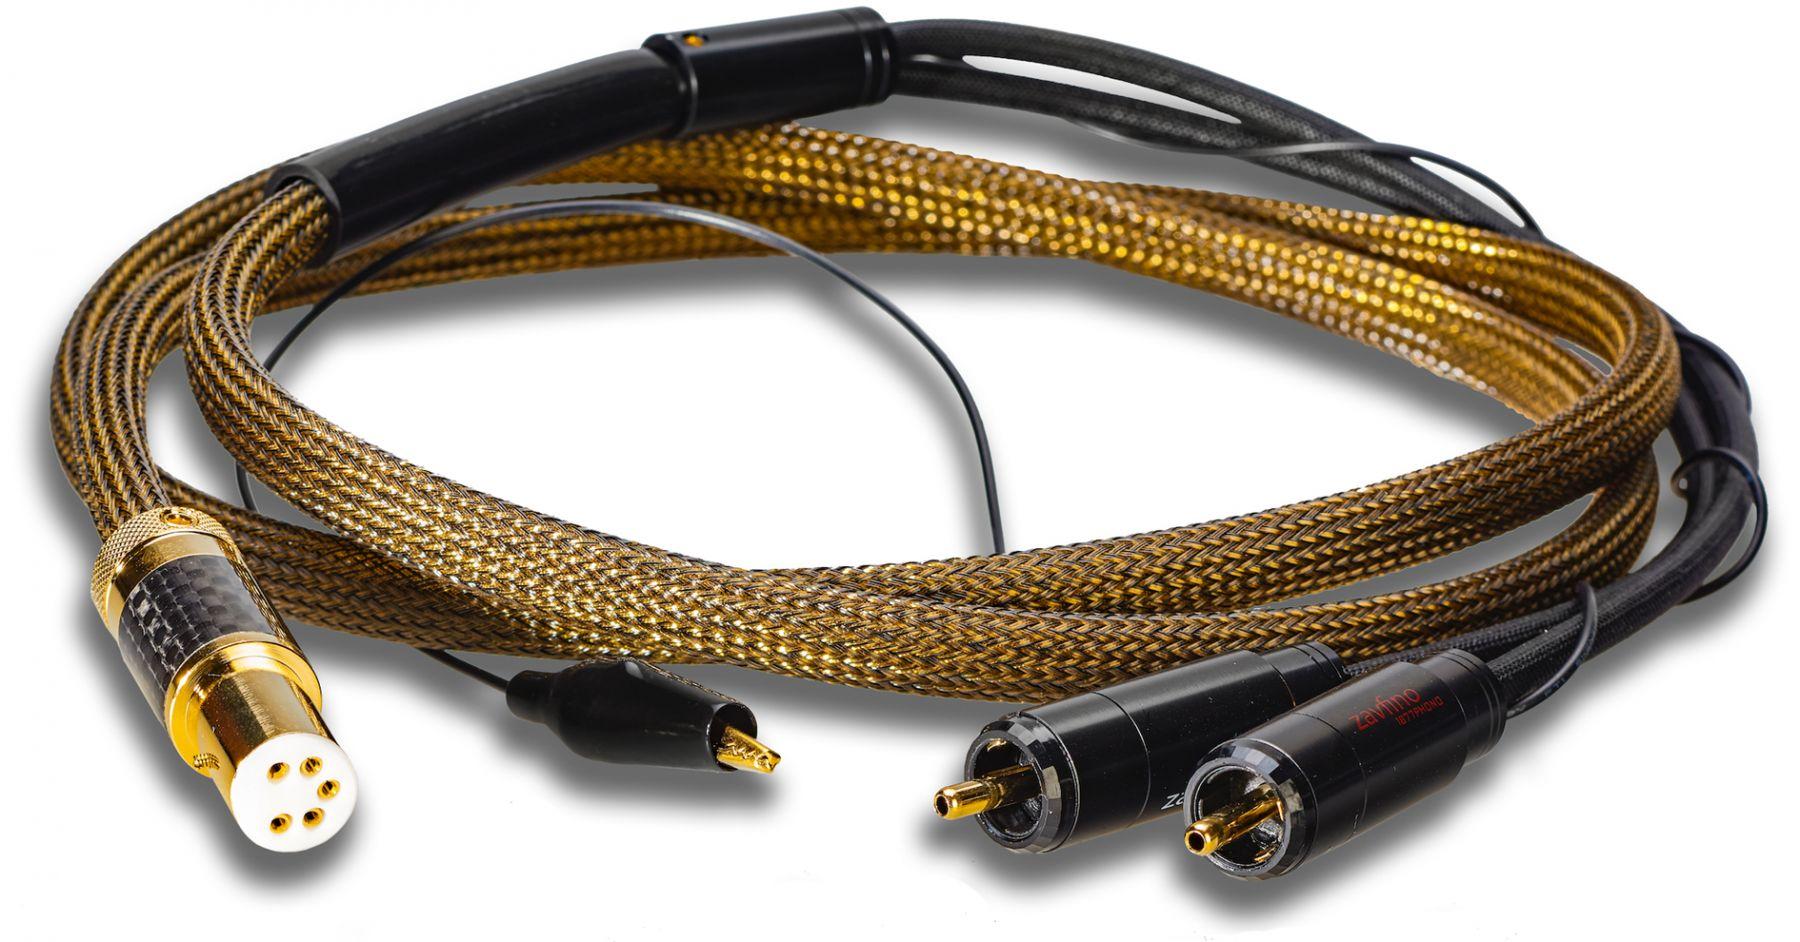 Фонокабель Zavfino Gold Rush (прямой DIN-RCA) 1.5m